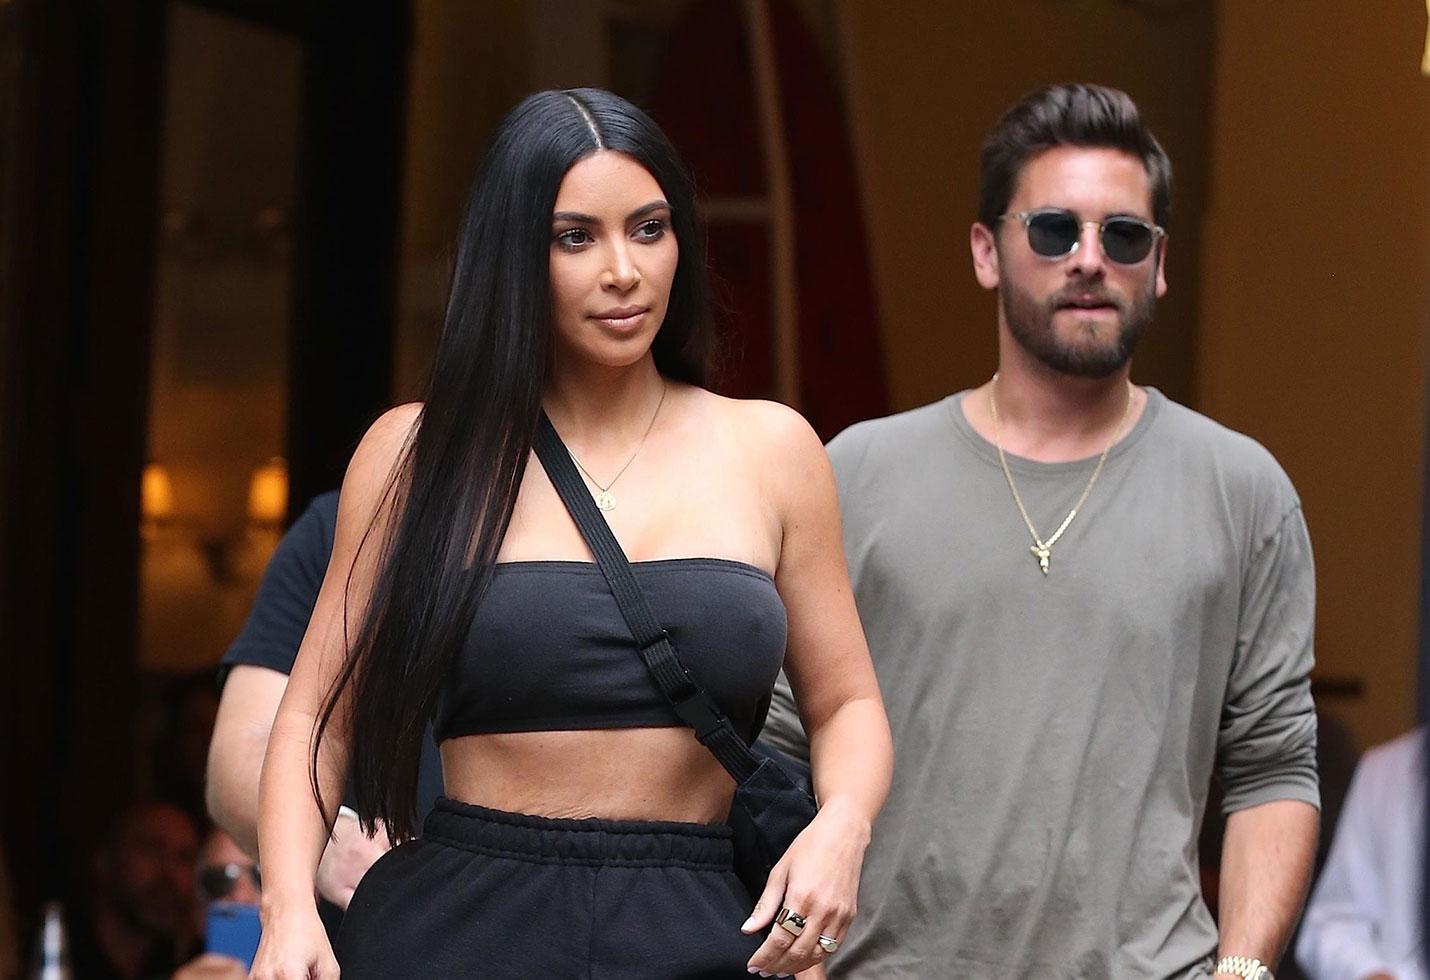 Kim kardashian shopping scott disick nyc